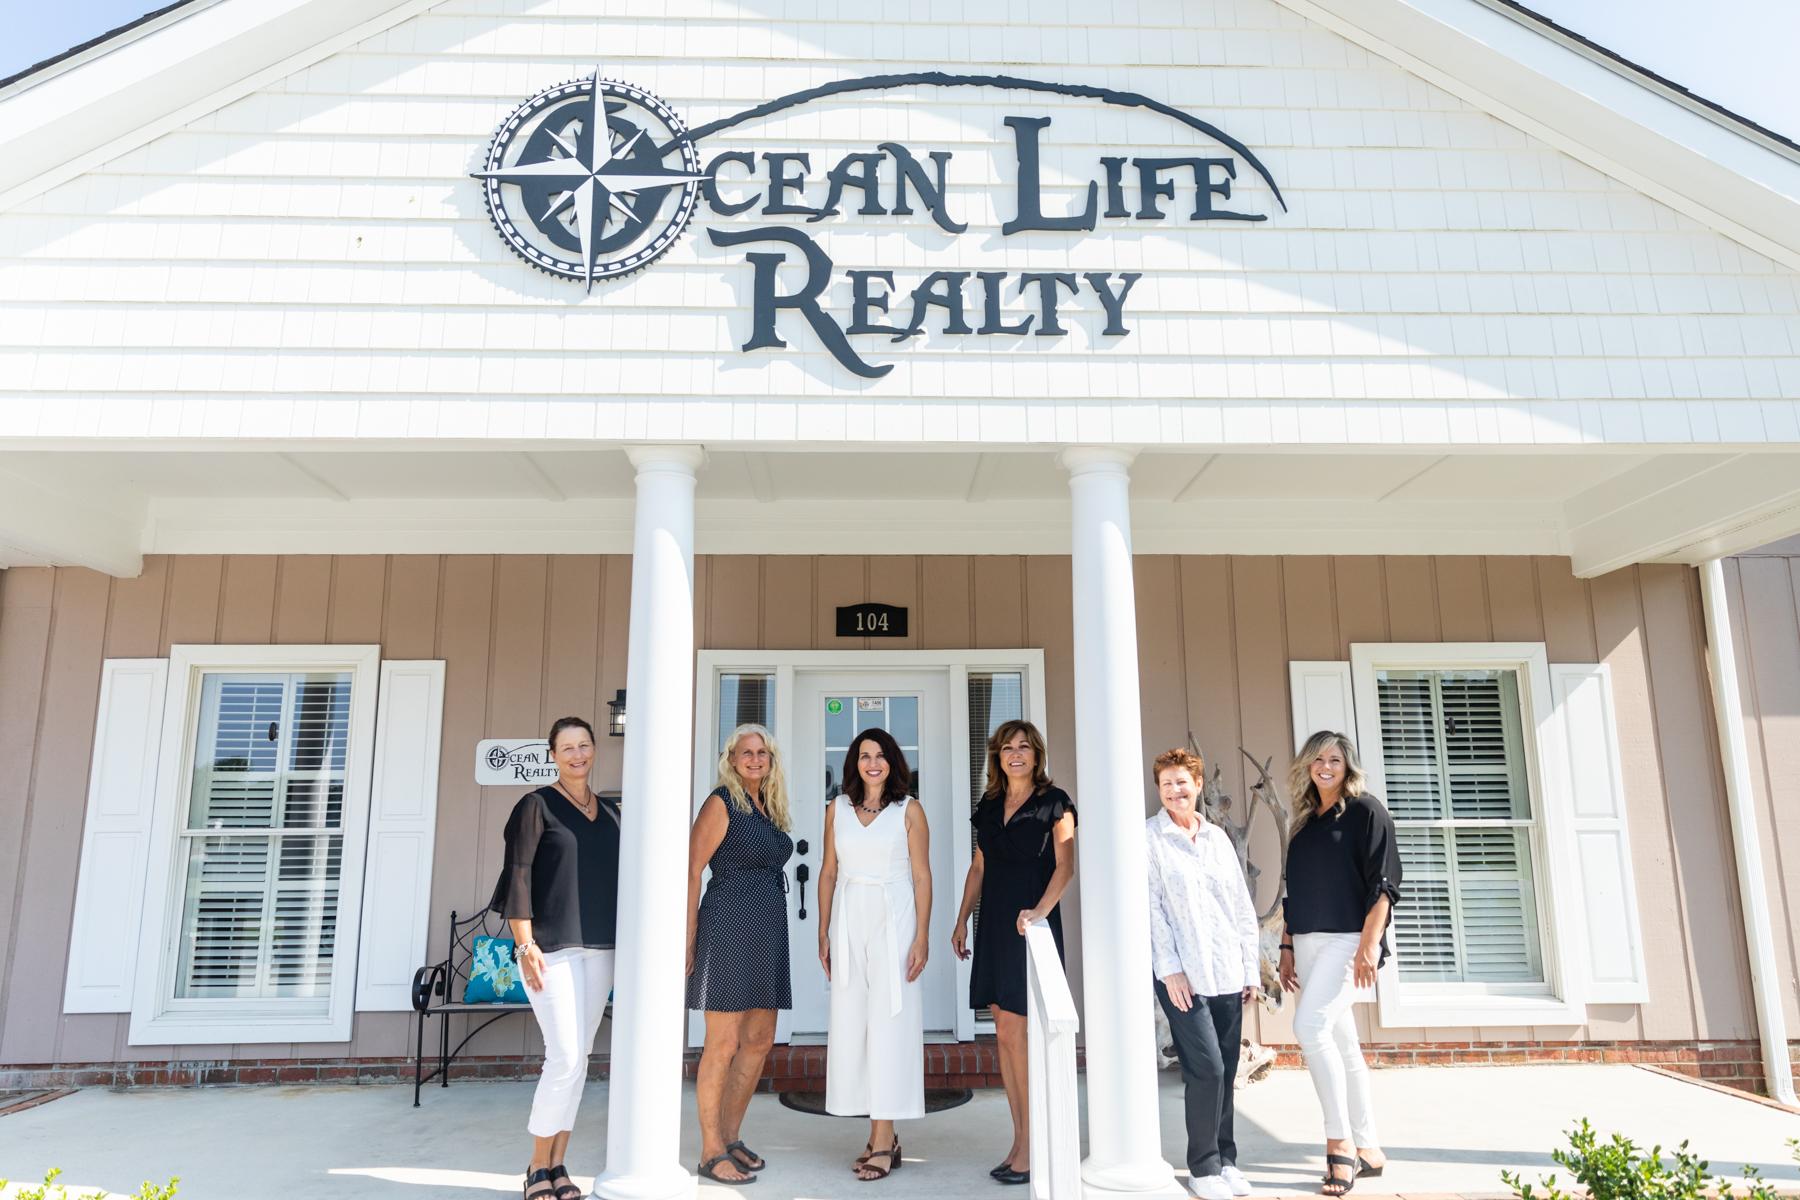 OCEAN LIFE REALTY OFFICE